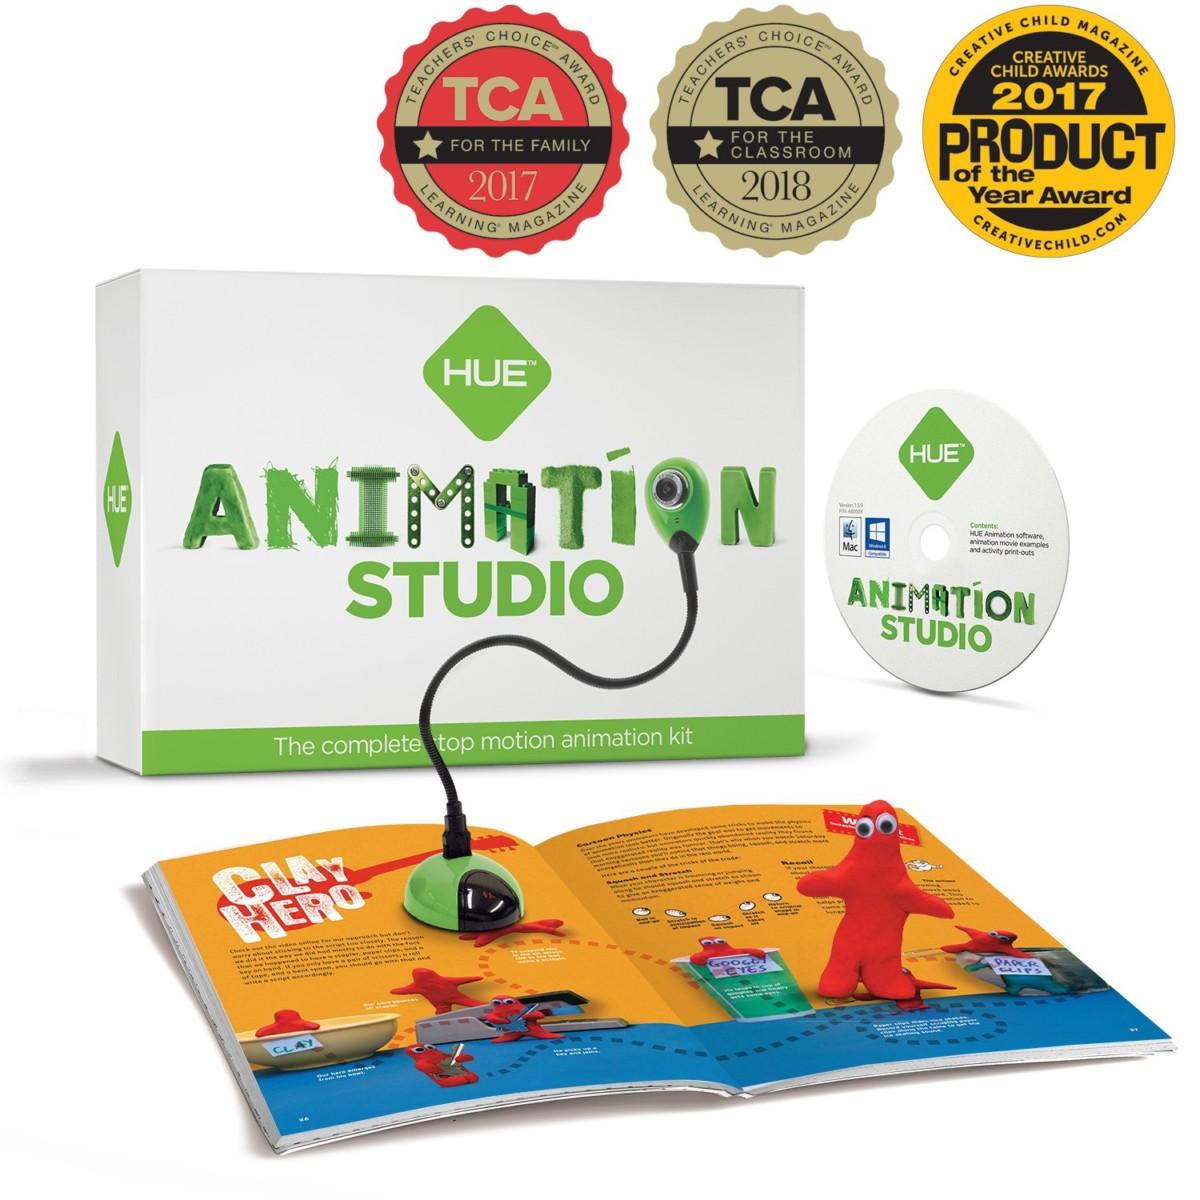 Hue Animation Studio product image